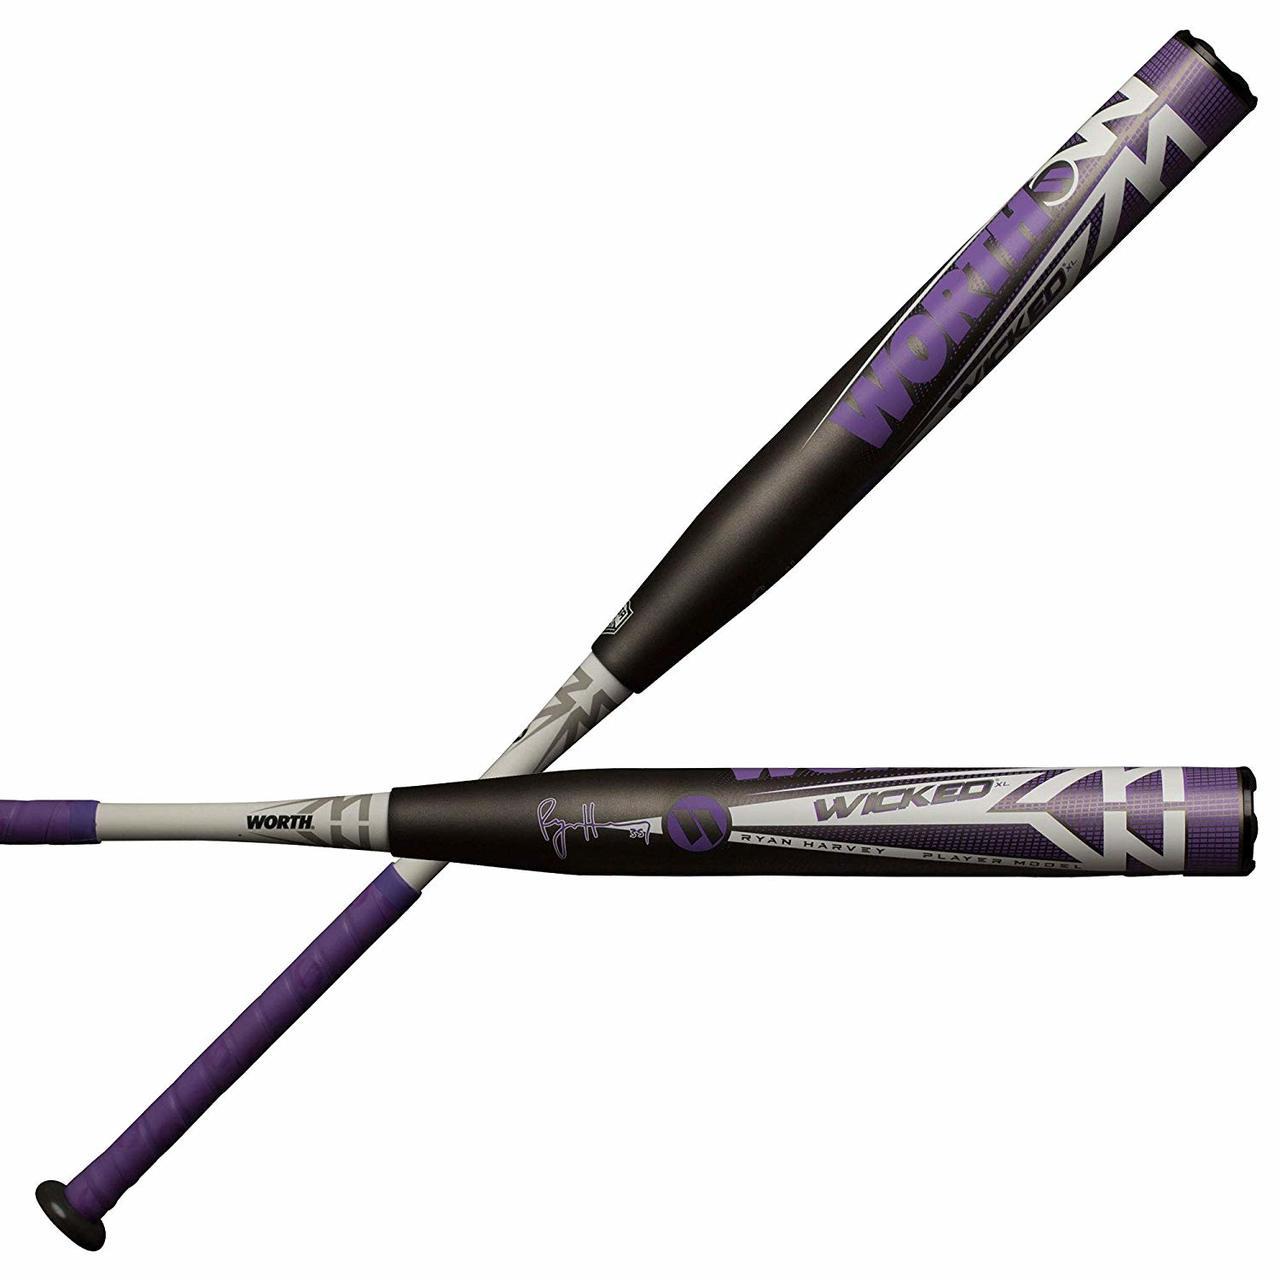 worth-wicked-xl-ryan-harvey-asa-wkrhma-slowpitch-softball-bat-34-inch-27-oz WKRHMA-3-27  658925041143 2 1/4 Inch Barrel Diameter 3-Piece Composite XL Weighting Approved for